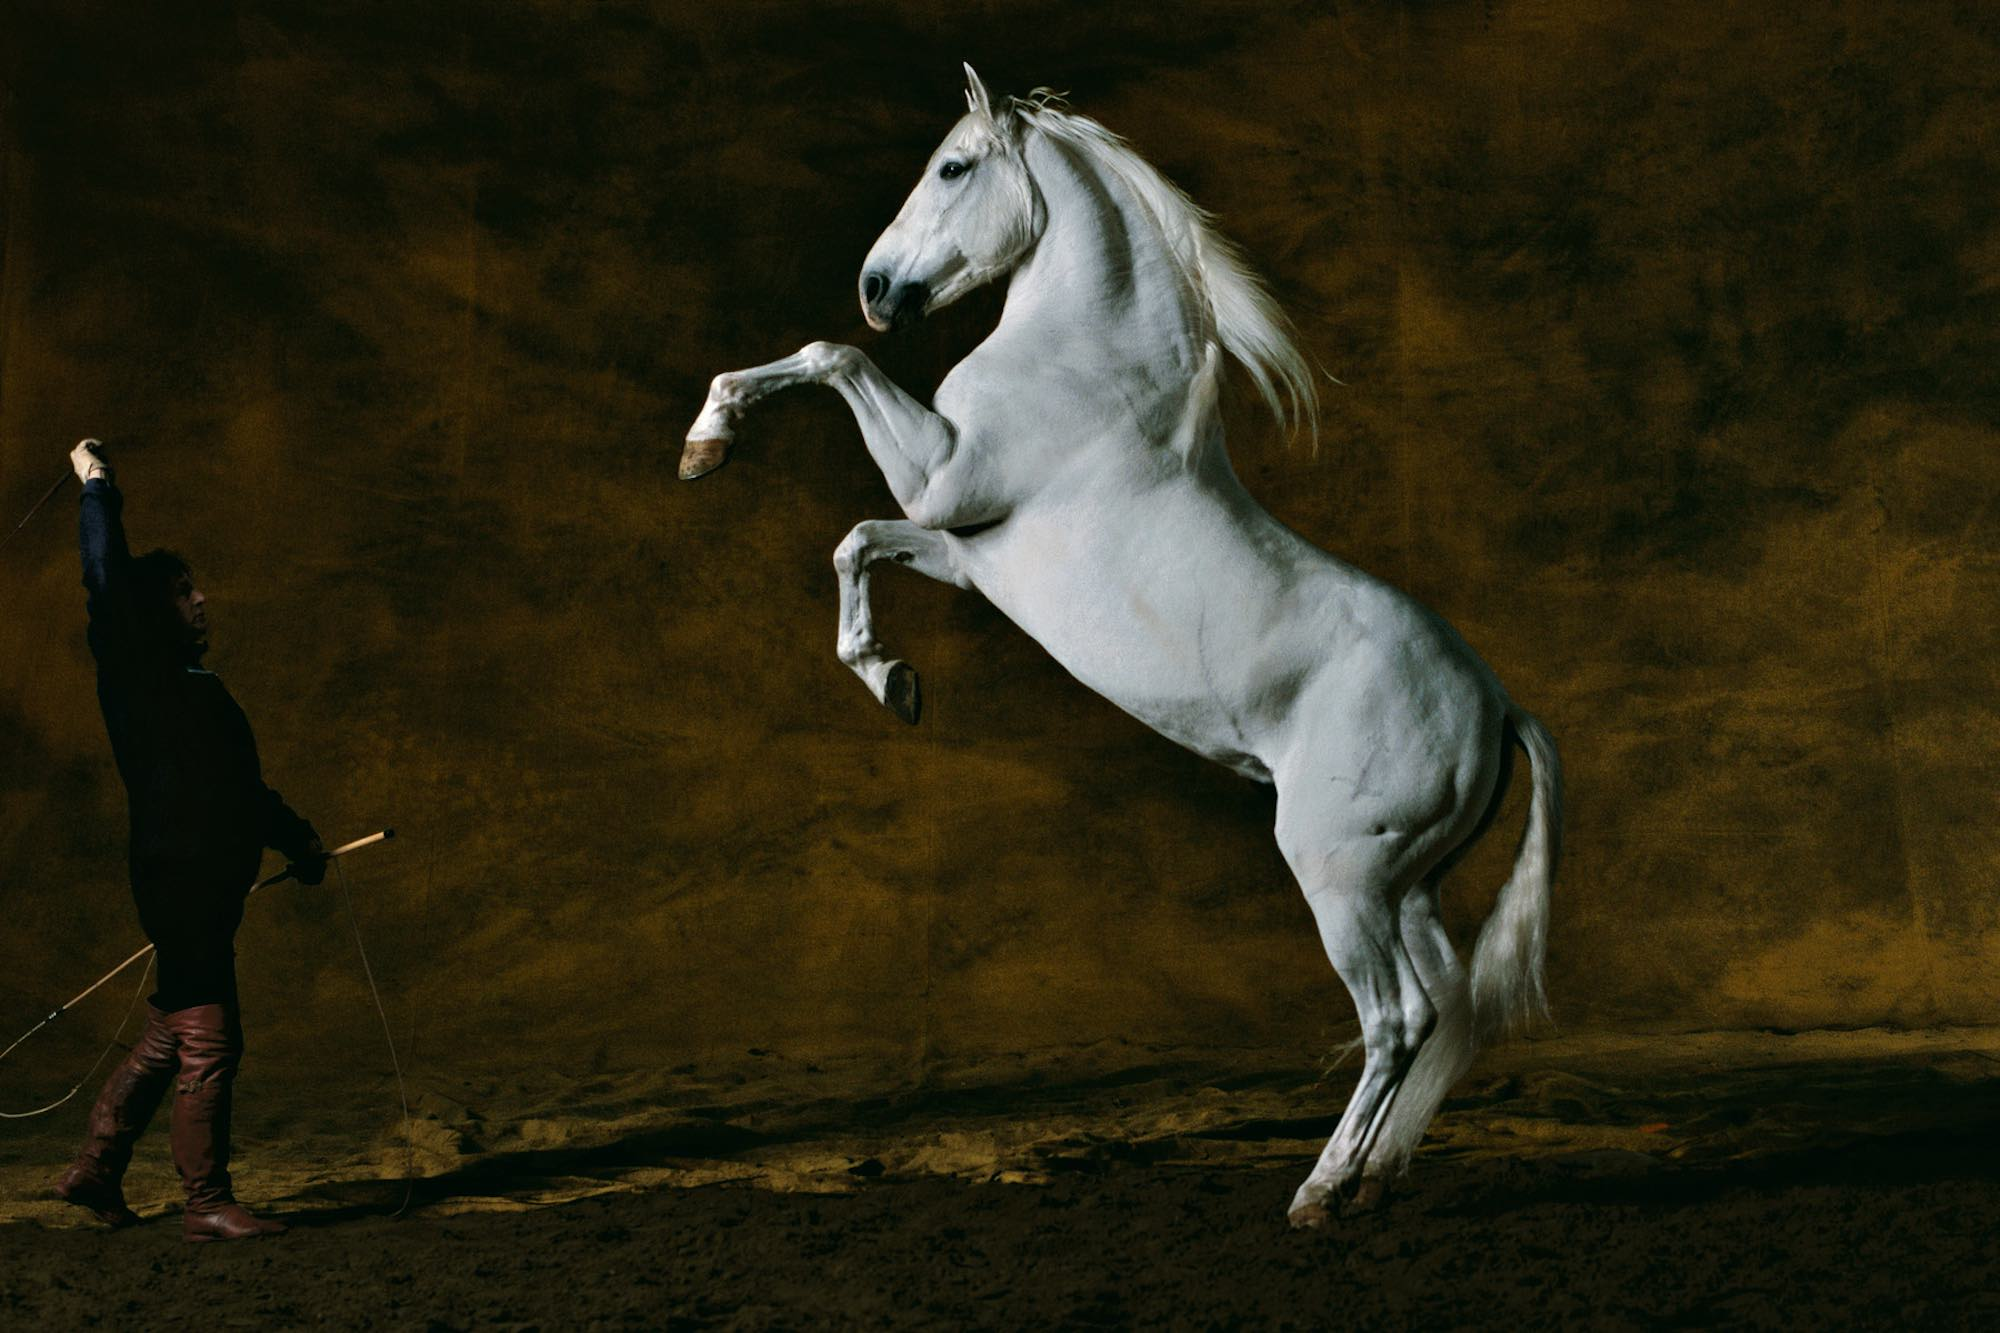 Pure-bred spanish stallion - Yann Arthus-Bertrand